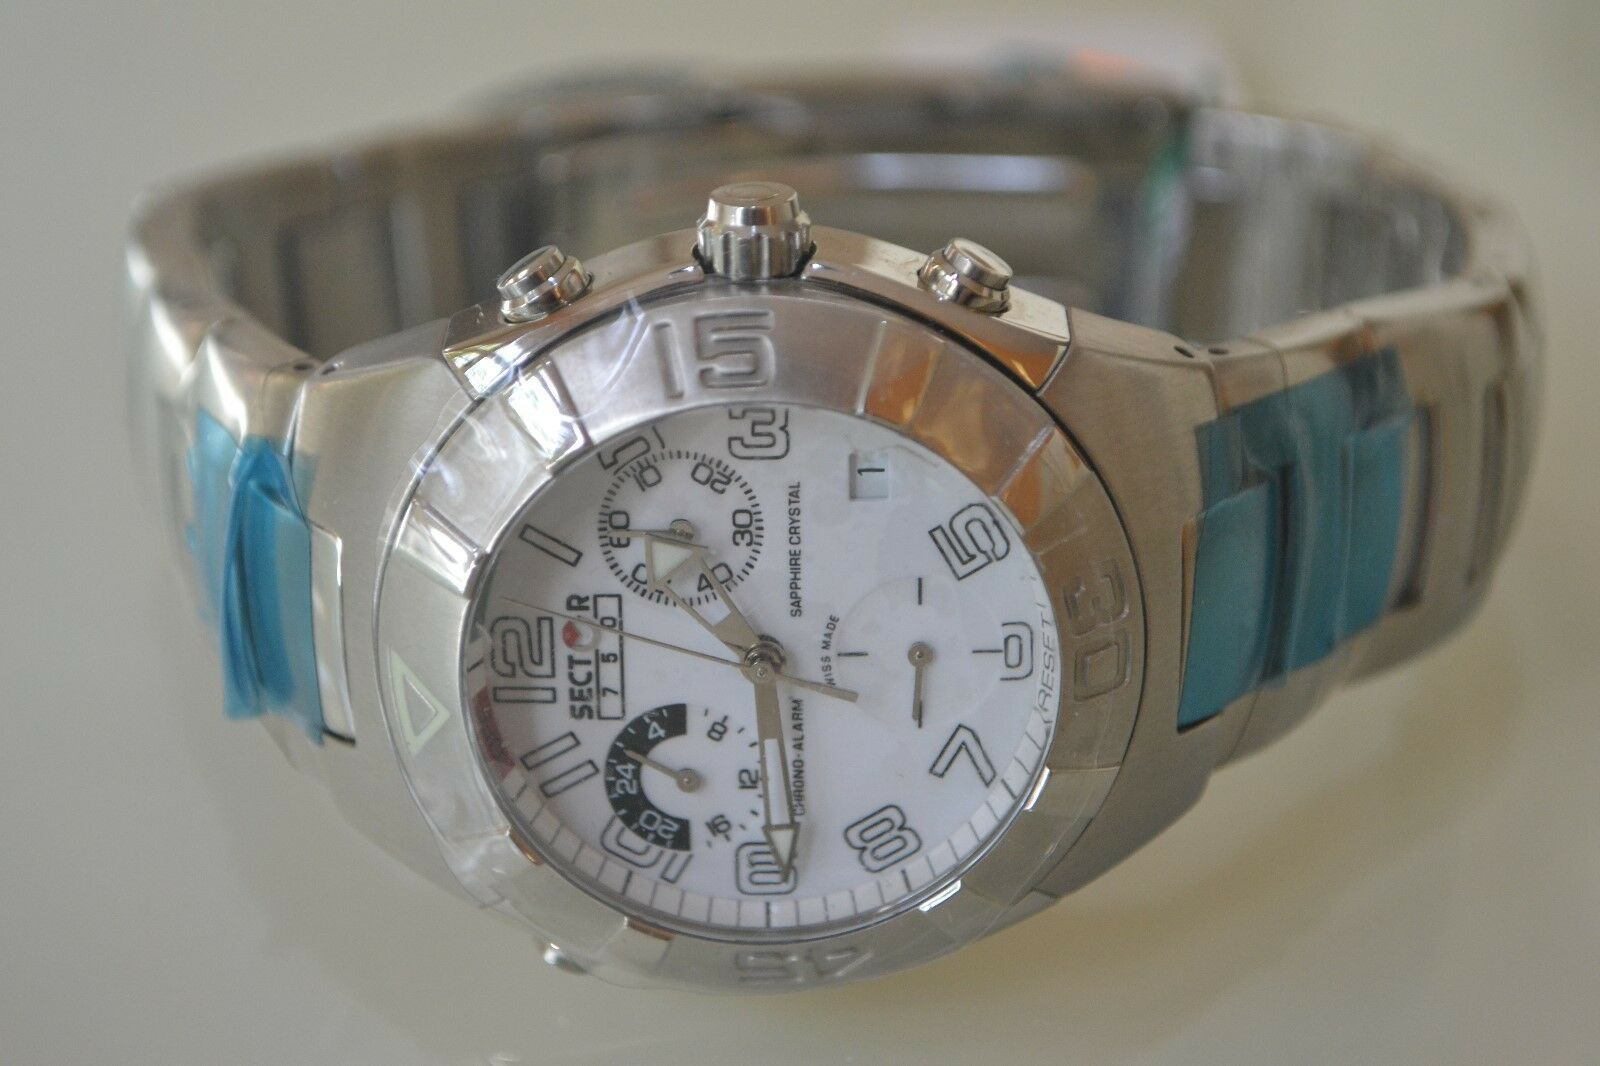 Cristal Crono Sector Hombre Vintage Reloj Alarma Zafiro 750 eQxrBWEdCo